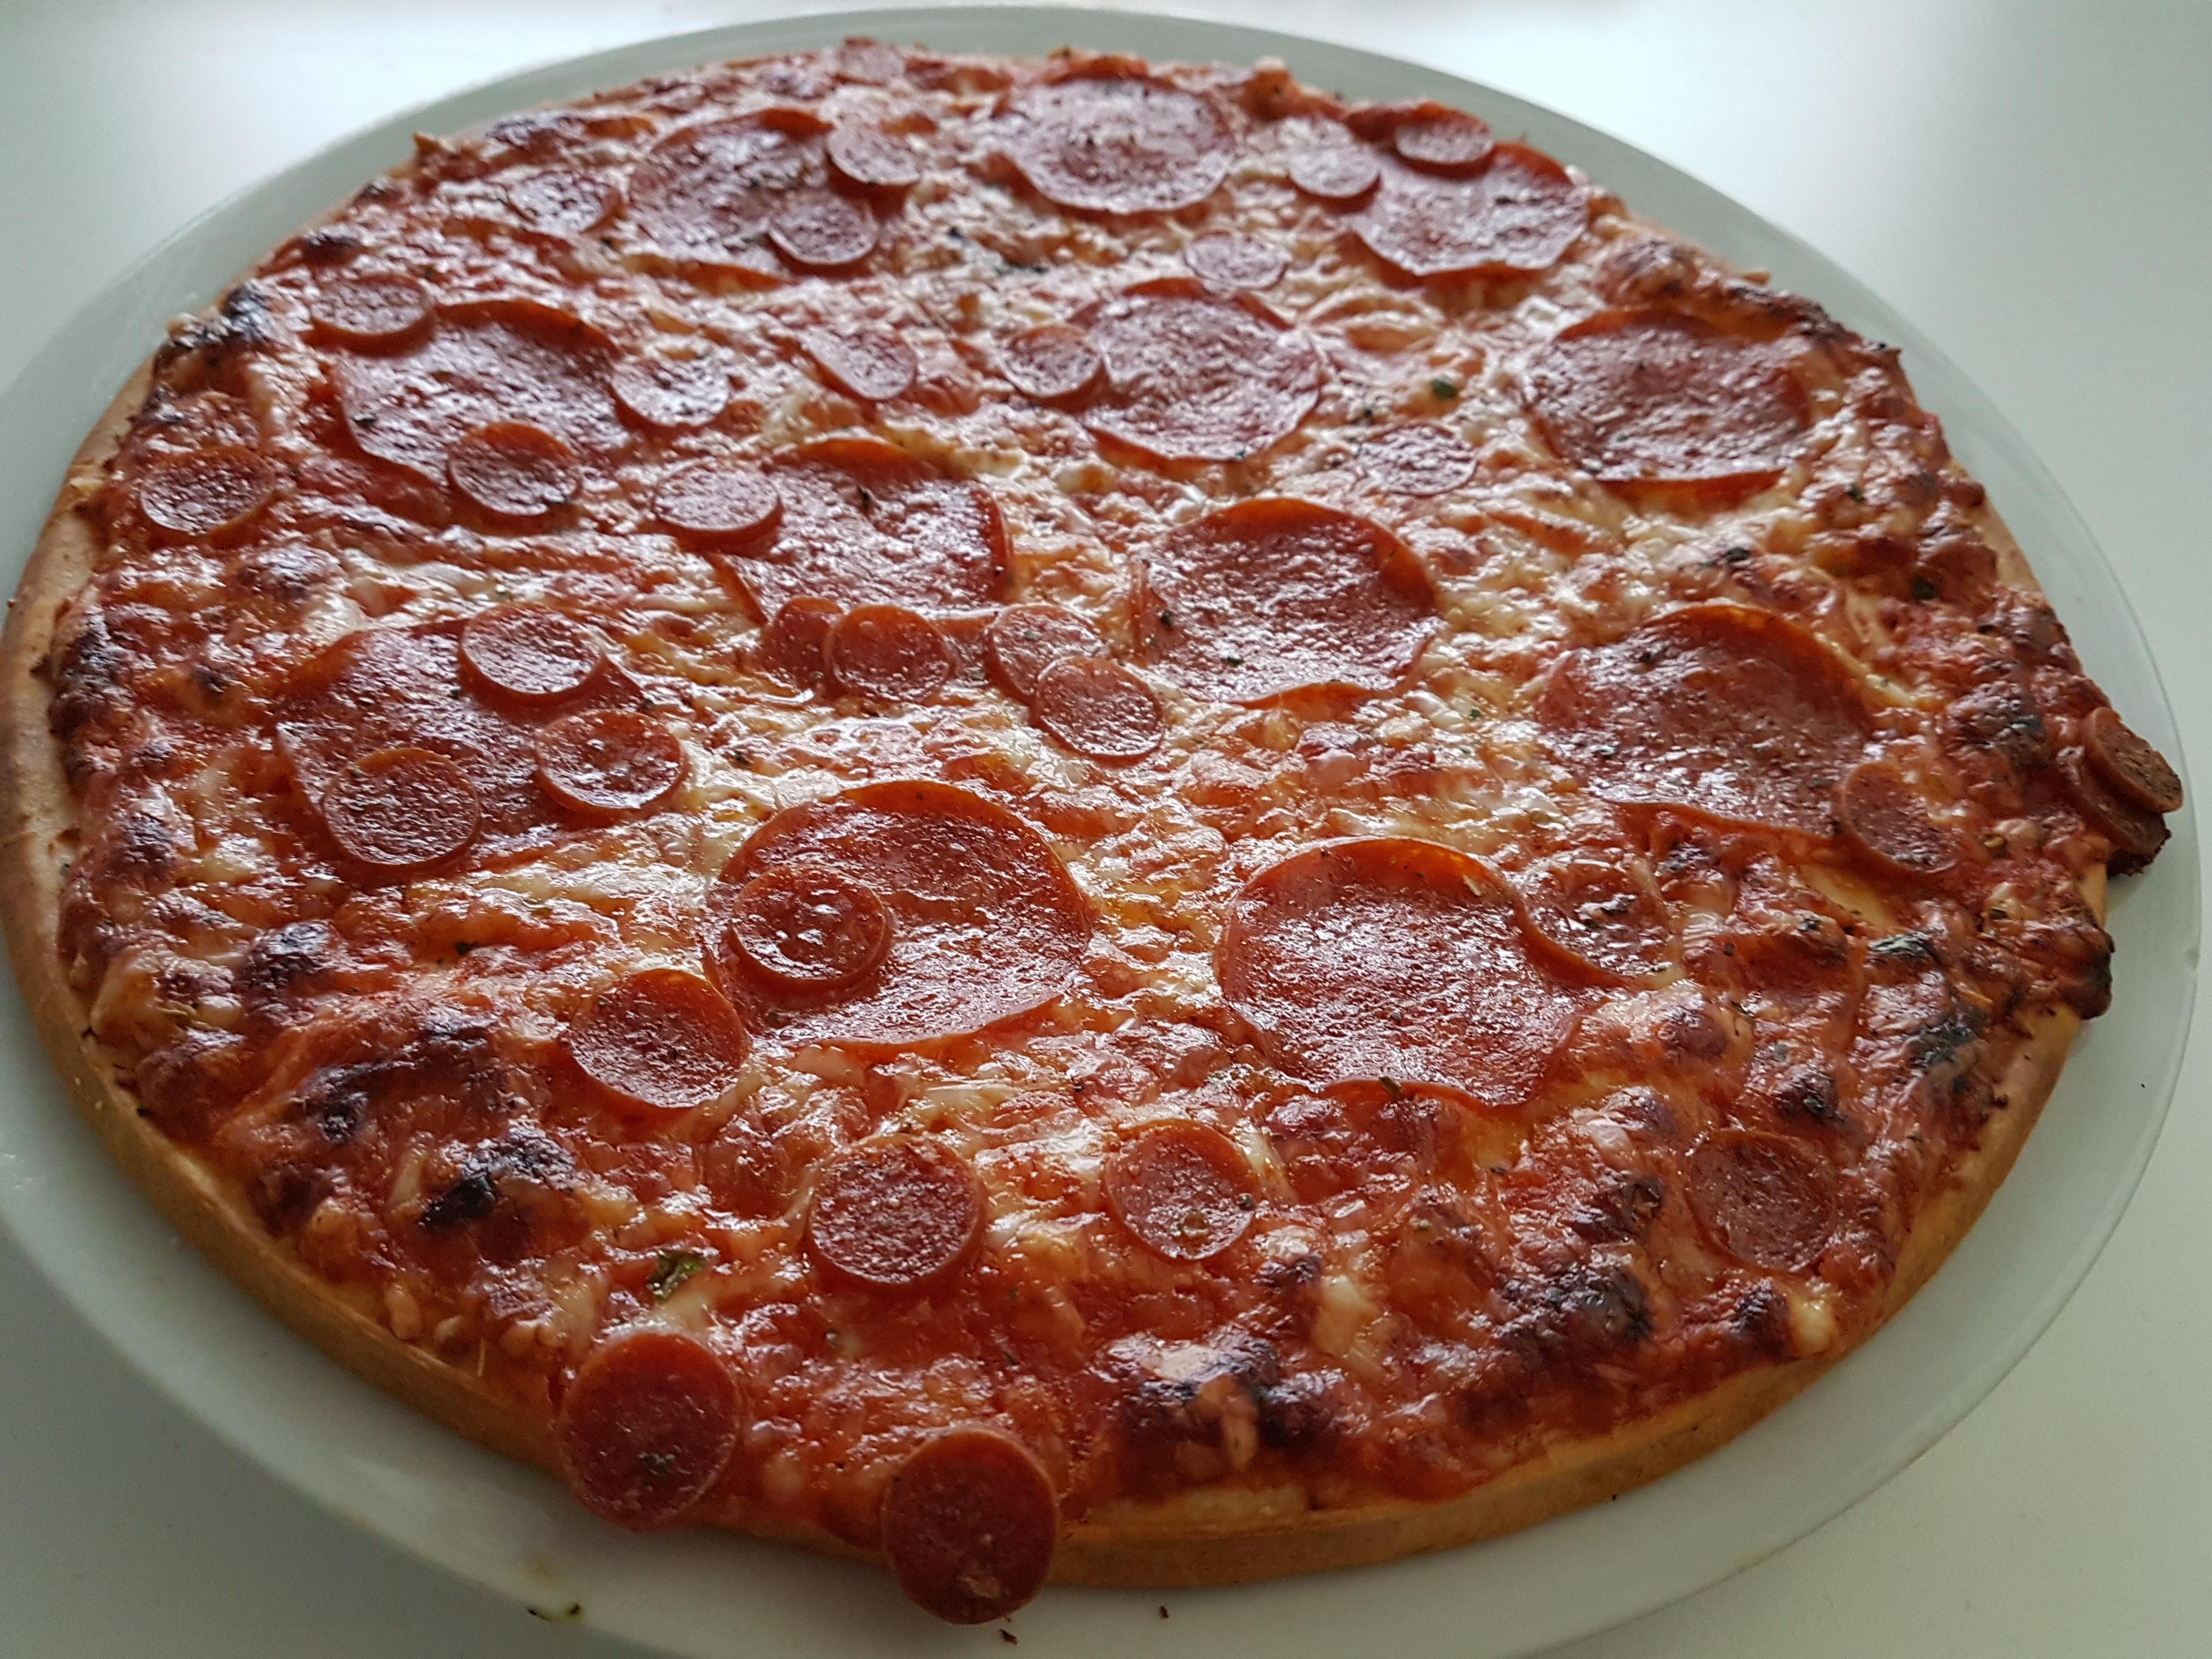 http://foodloader.net/Holz_2017-04-16_Pizza.jpg